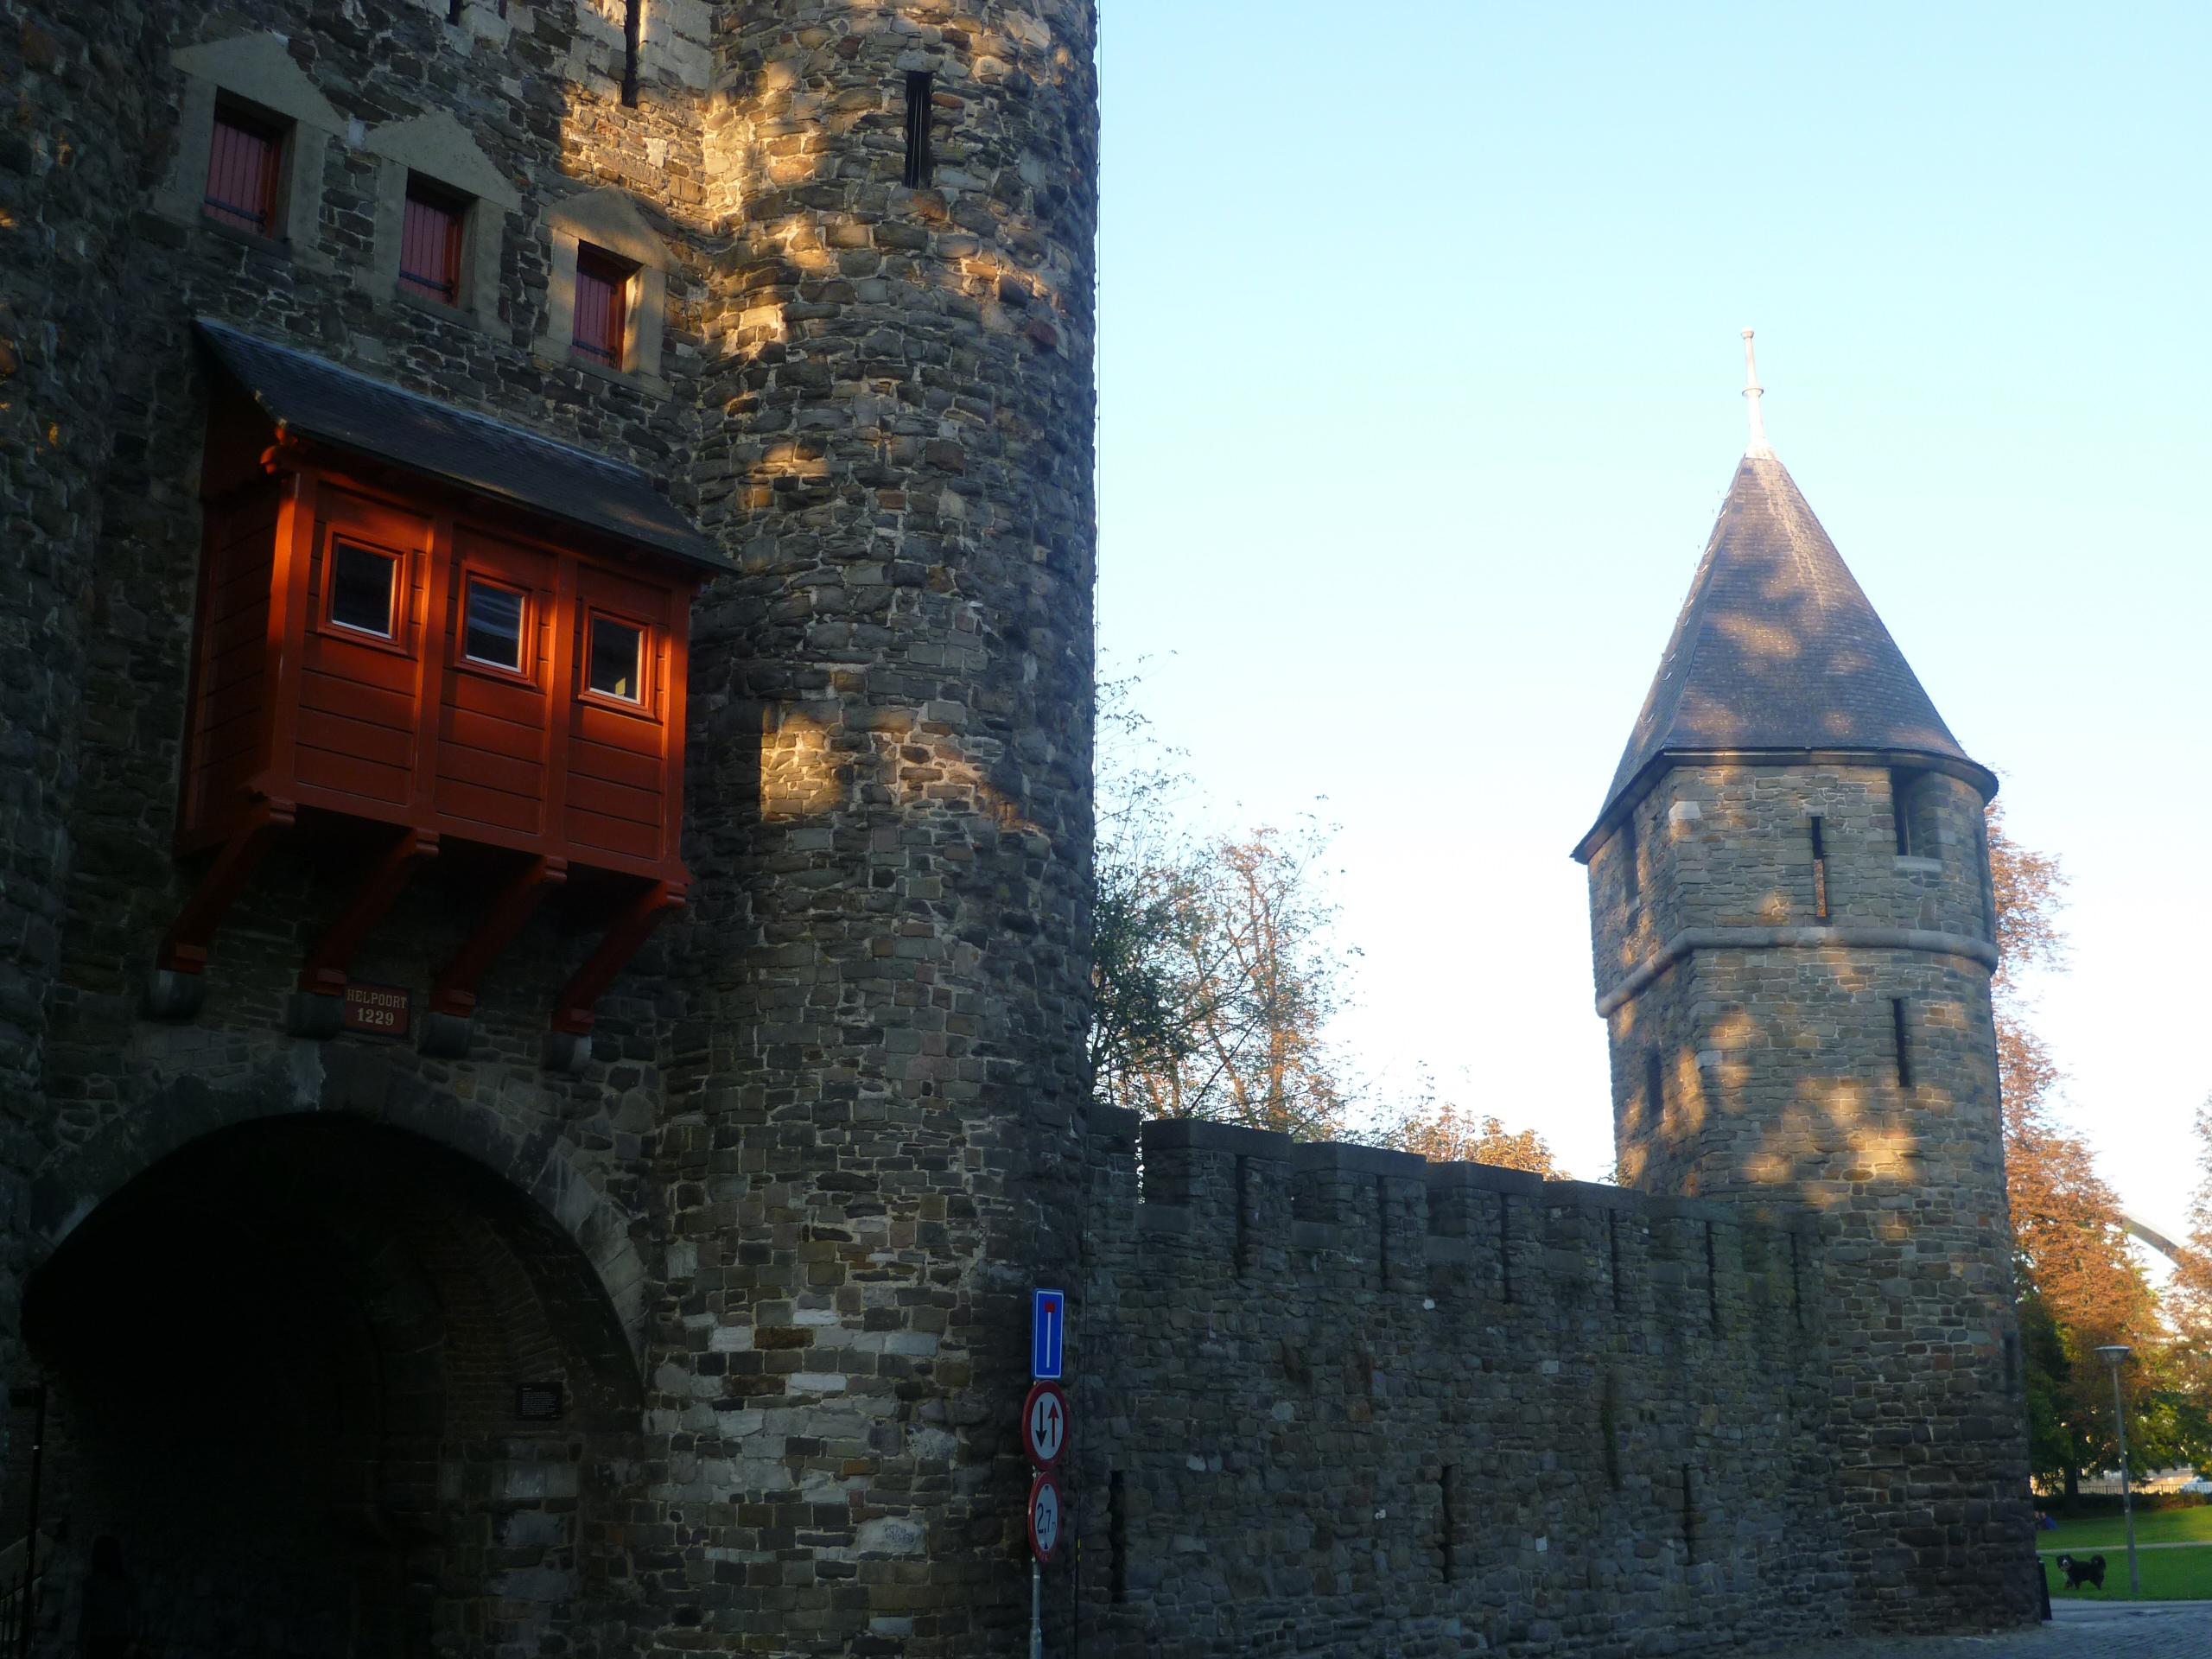 Hellpoort city gate in Maastricht